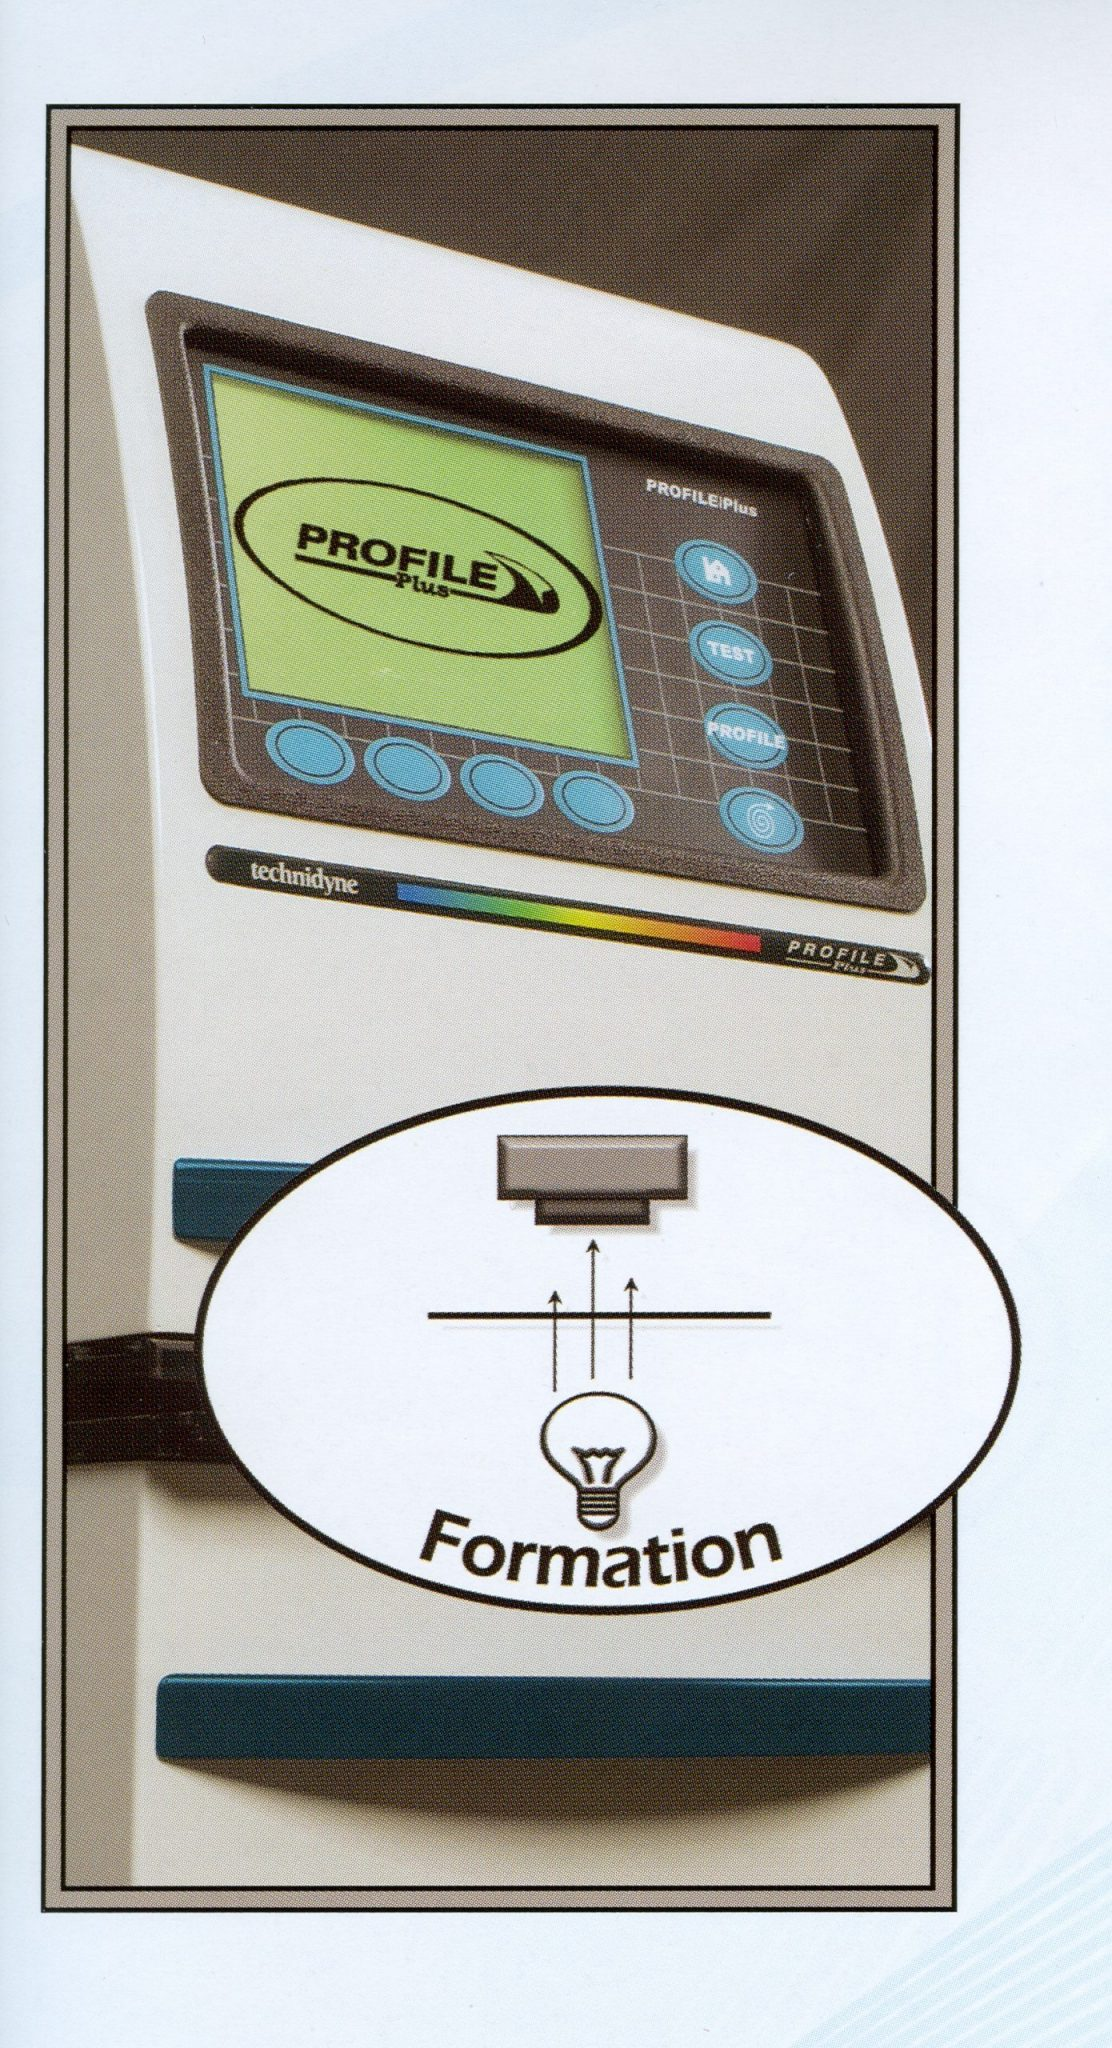 PROFILE Plus Formation - Technidyne